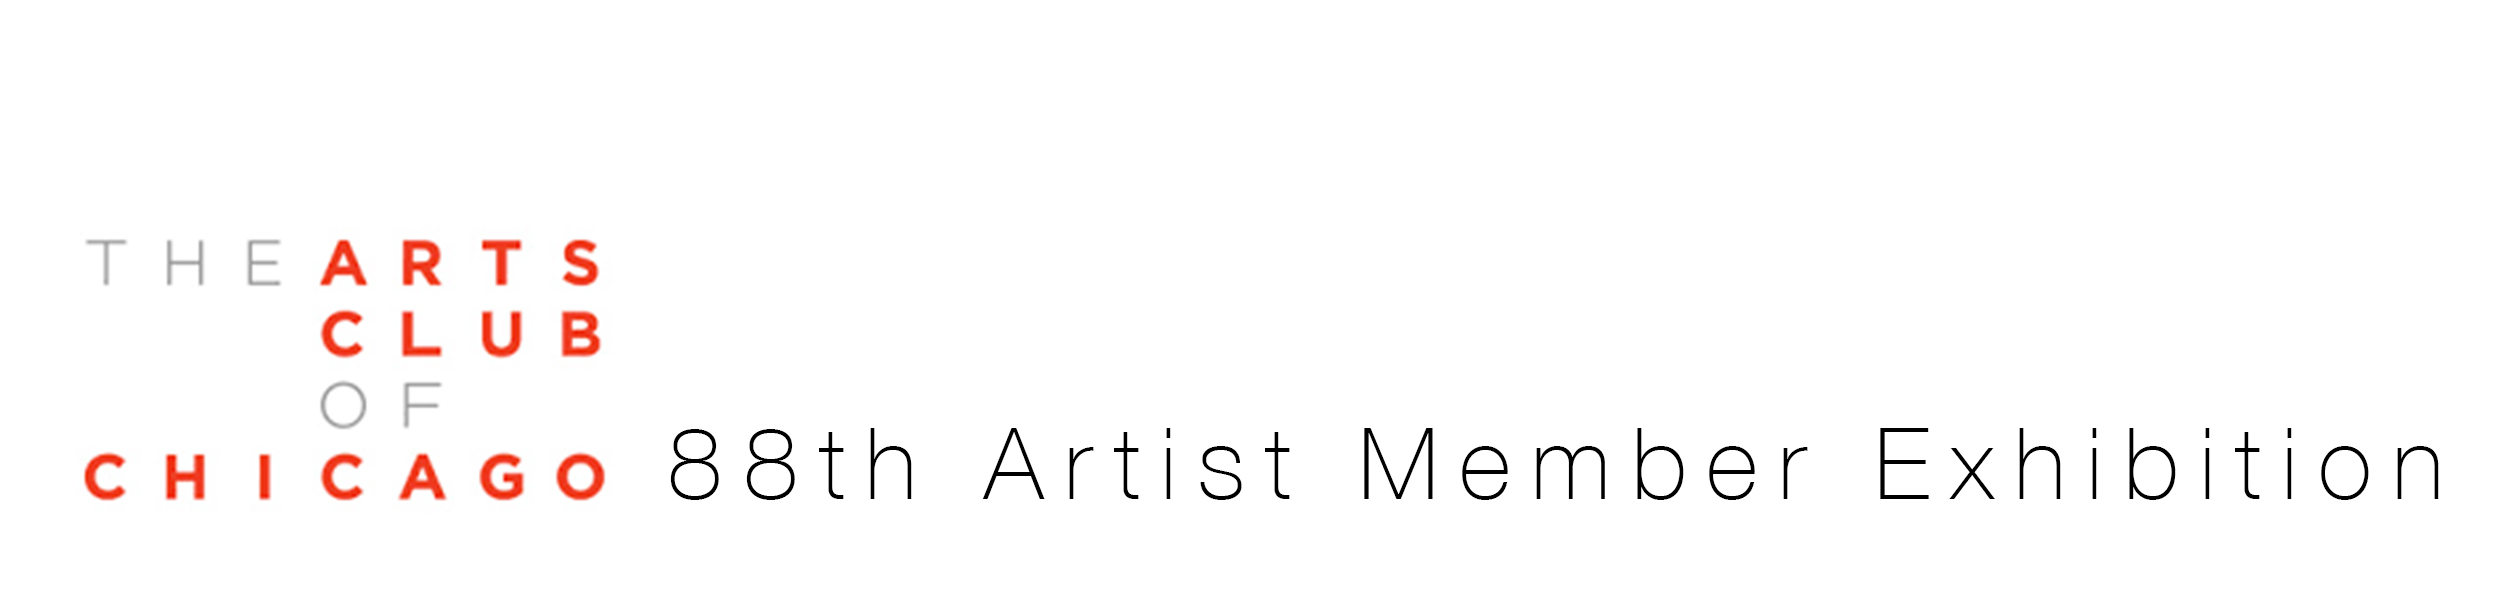 arts club of chicago, website banner.jpg